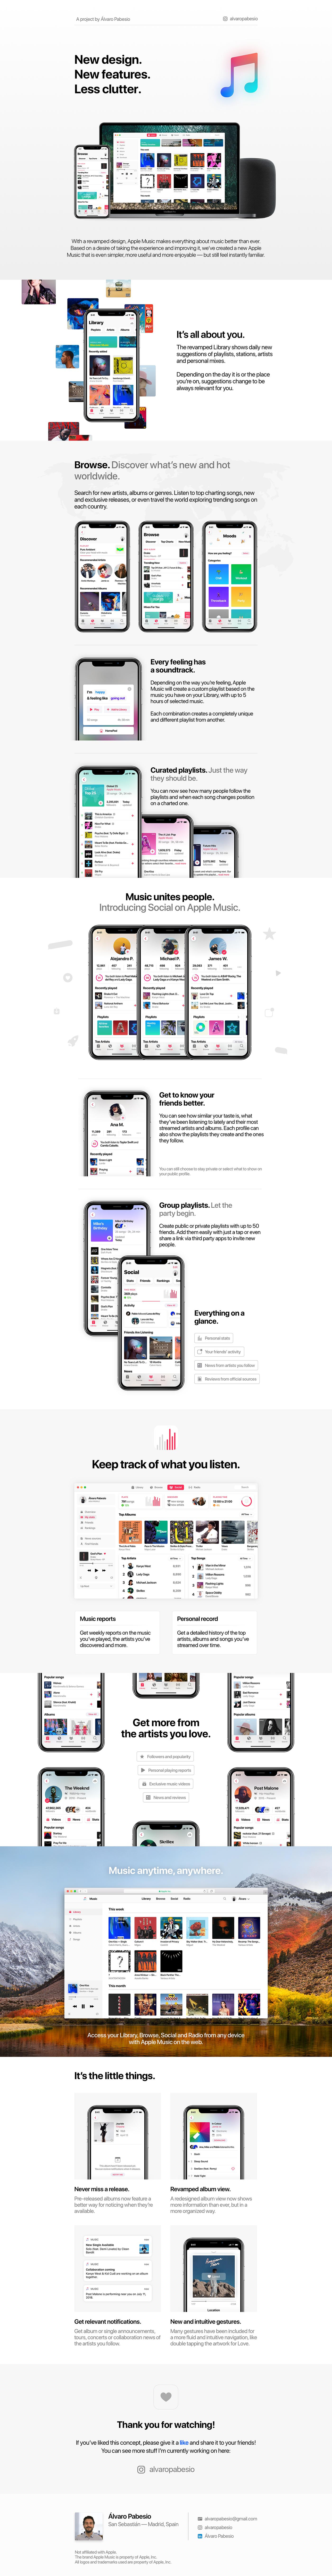 Apple Music apple music Streaming spotify macos ios